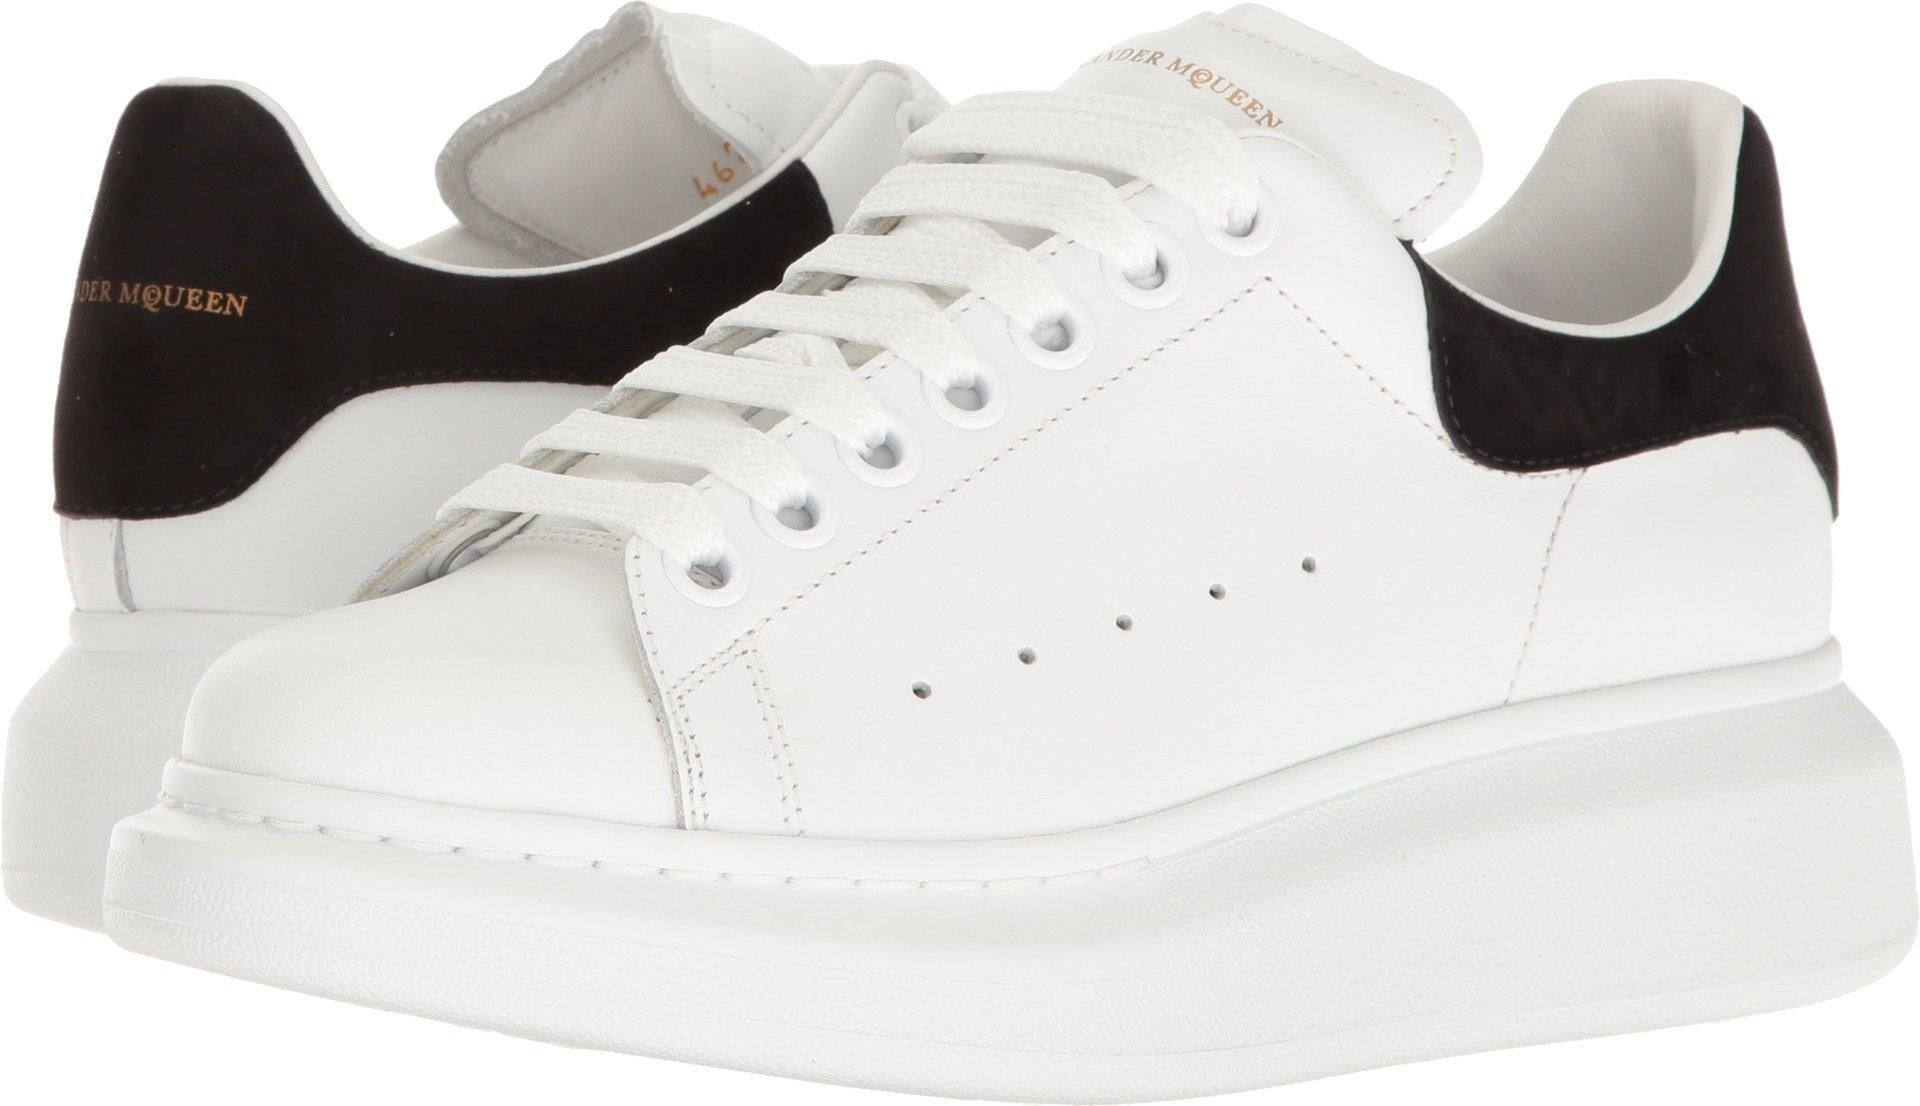 Alexander McQueen Women's Lace-Up Sneaker White/Black 36.5 M EU